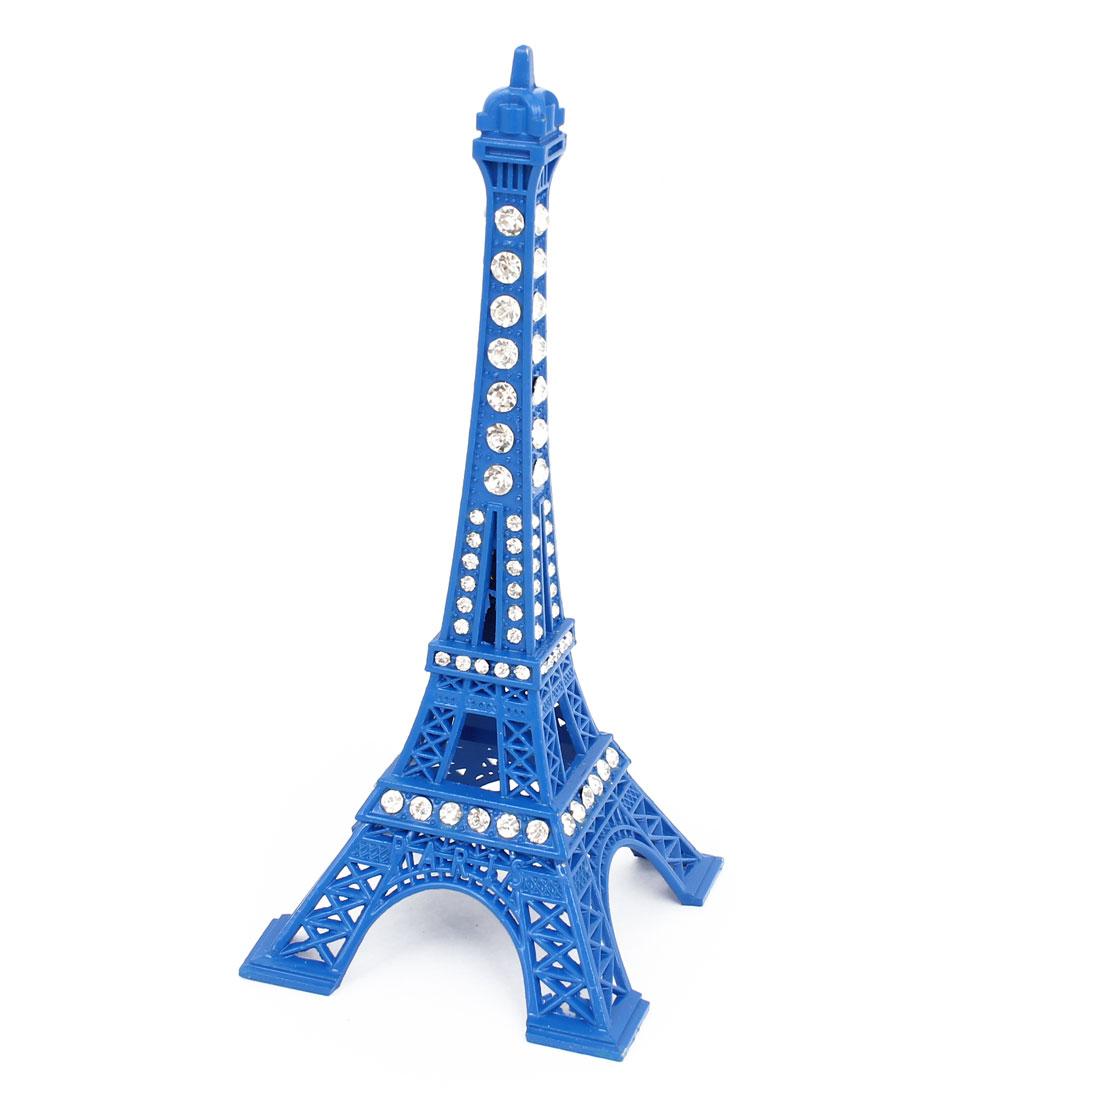 Rhinestone Mini Eiffel Tower Paris France Souvenir Metal Statue Model 13cm